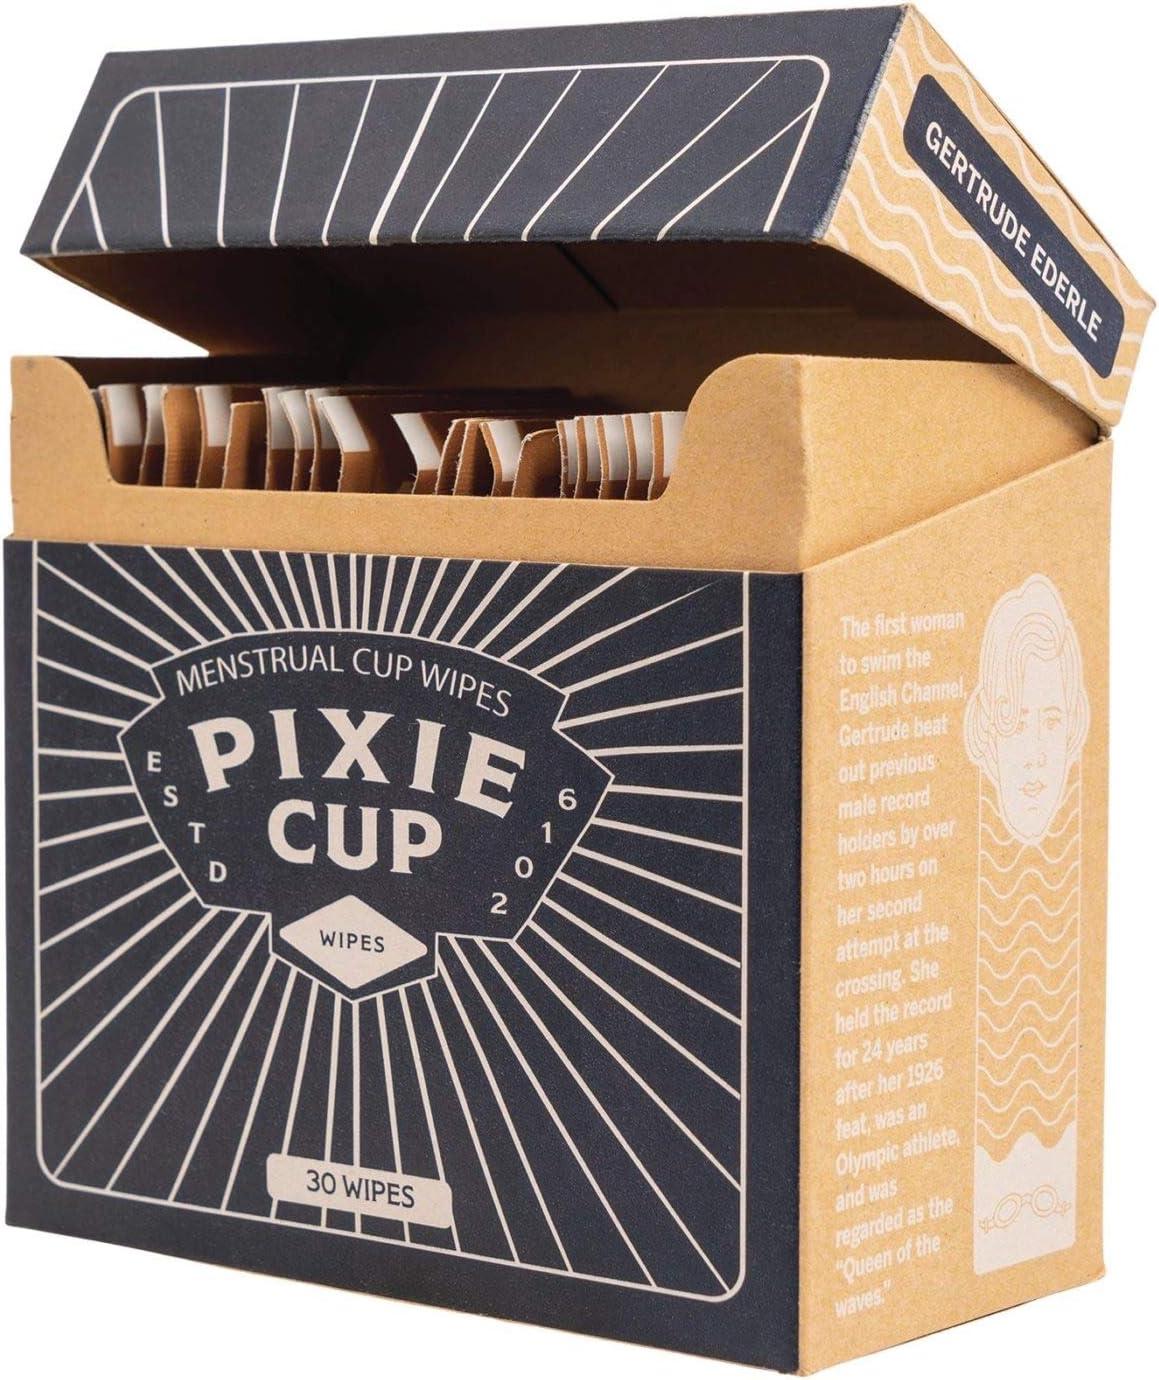 Pixie Cup Las toallitas recomendado para su Copas período de 100% Biodegradable Libre de Alcohol antiséptico olor floral